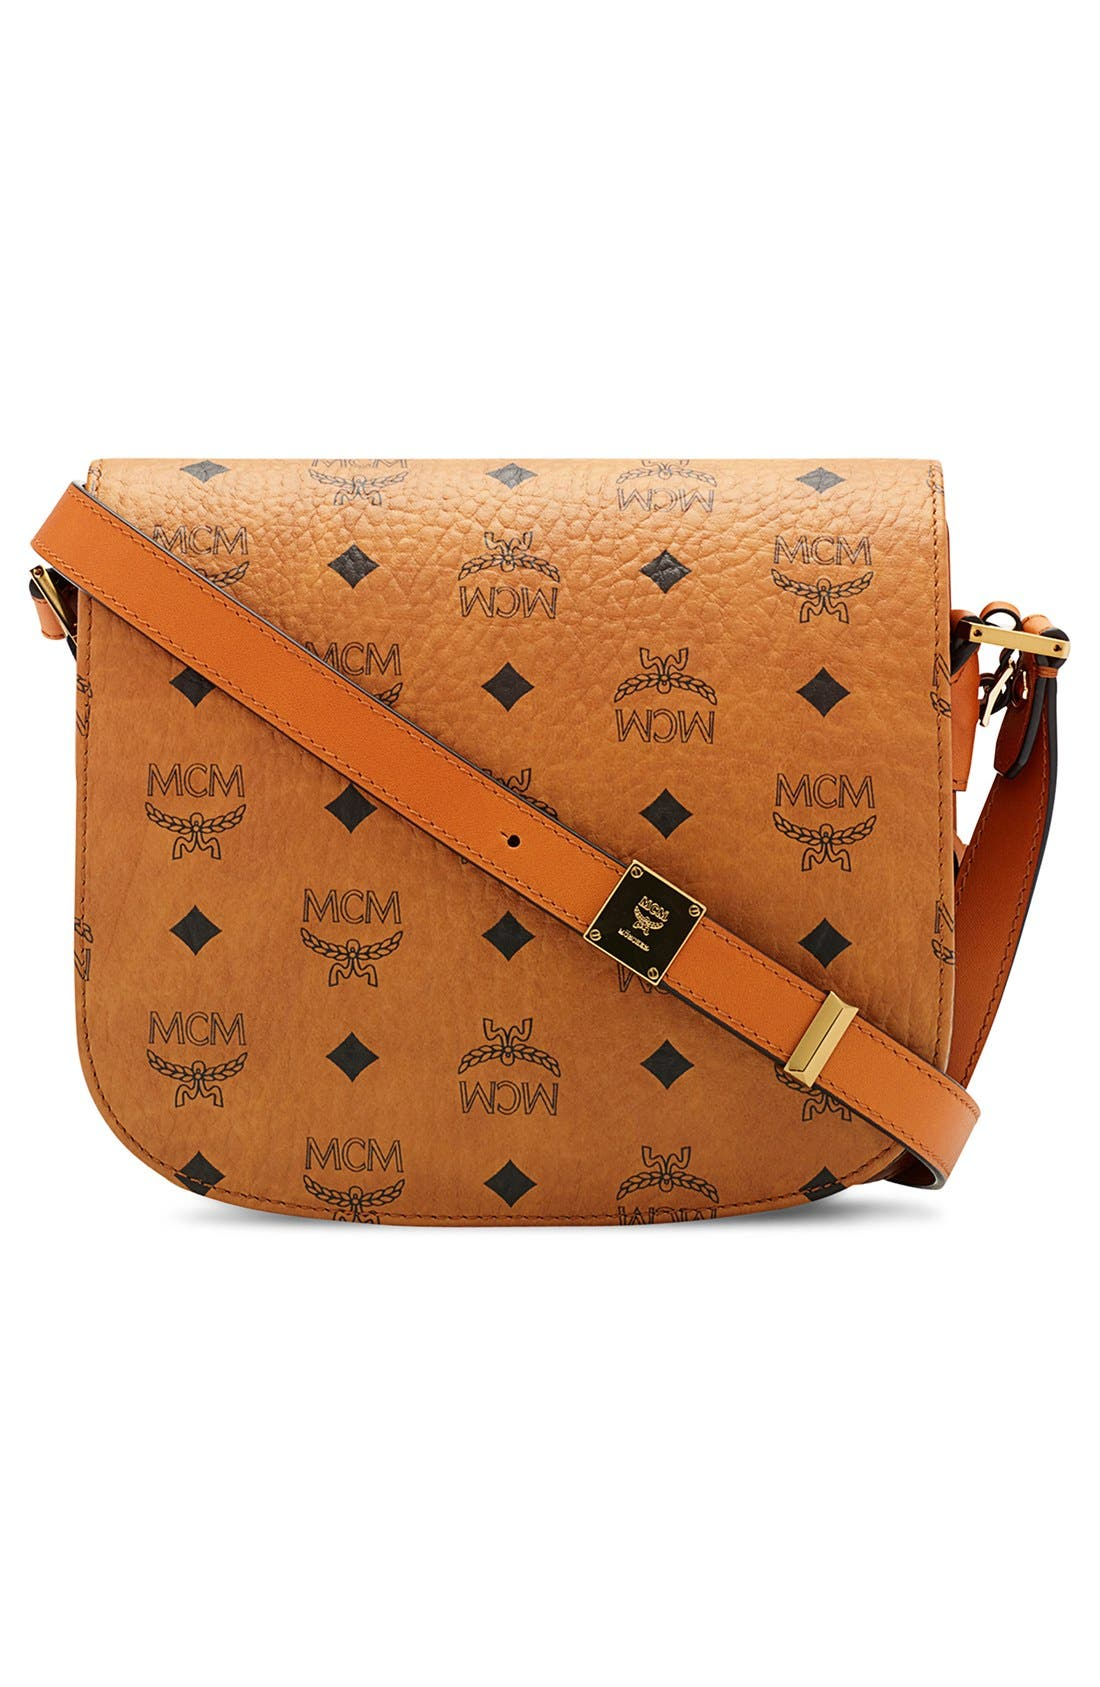 Alternate Image 3  - MCM 'Small Patricia' Visetos Coated Canvas Crossbody Bag